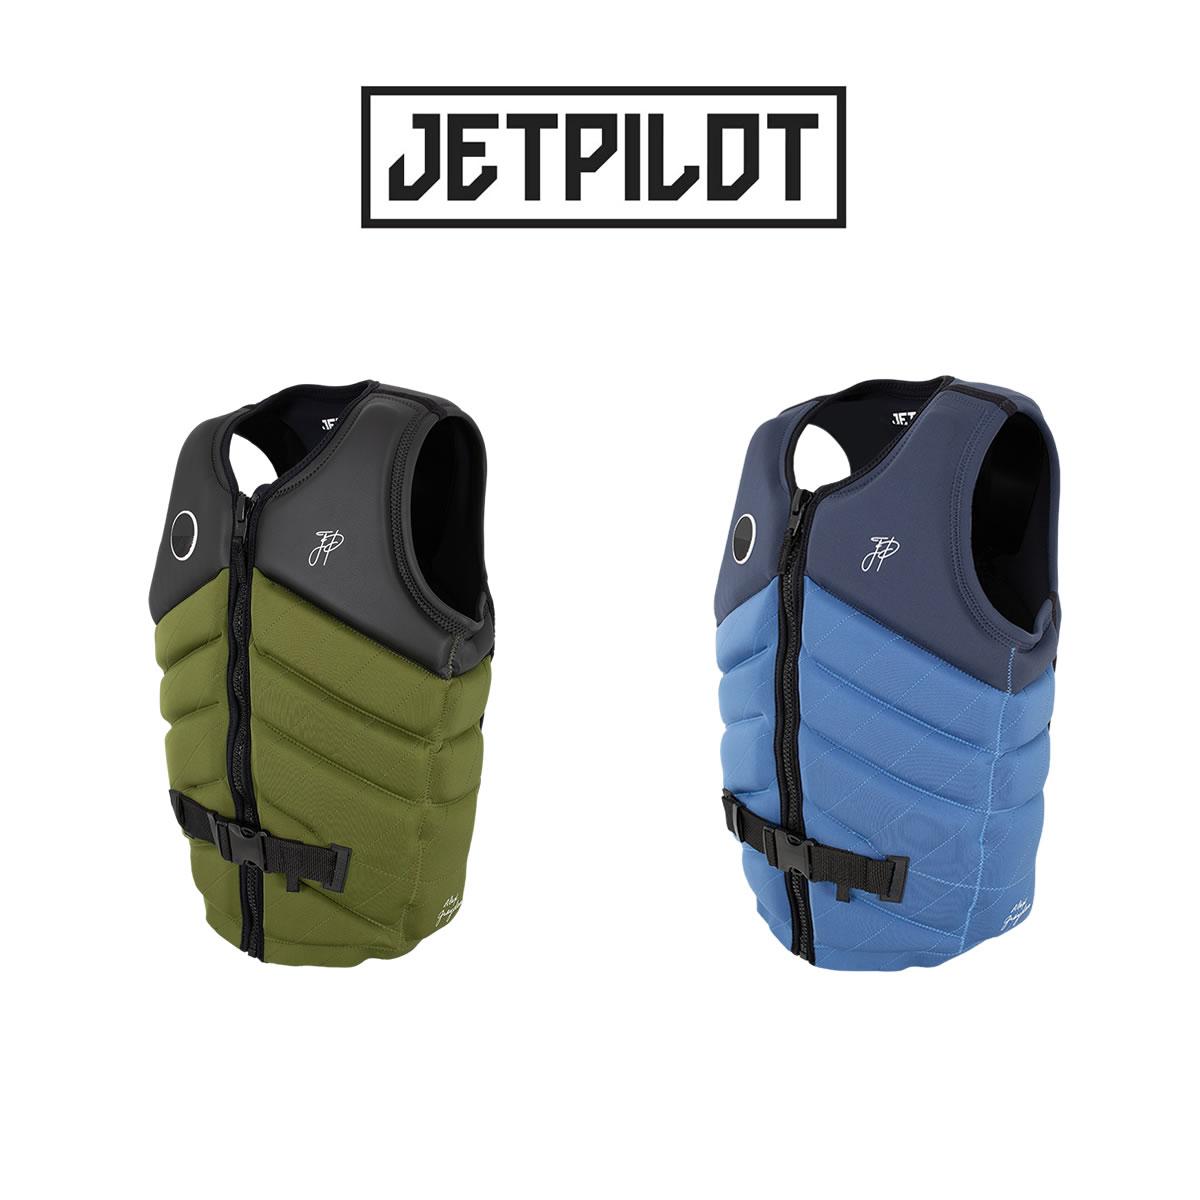 JETPILOT(ジェットパイロット)ネオベスト アレックス F/Eネオベスト(JA21306)